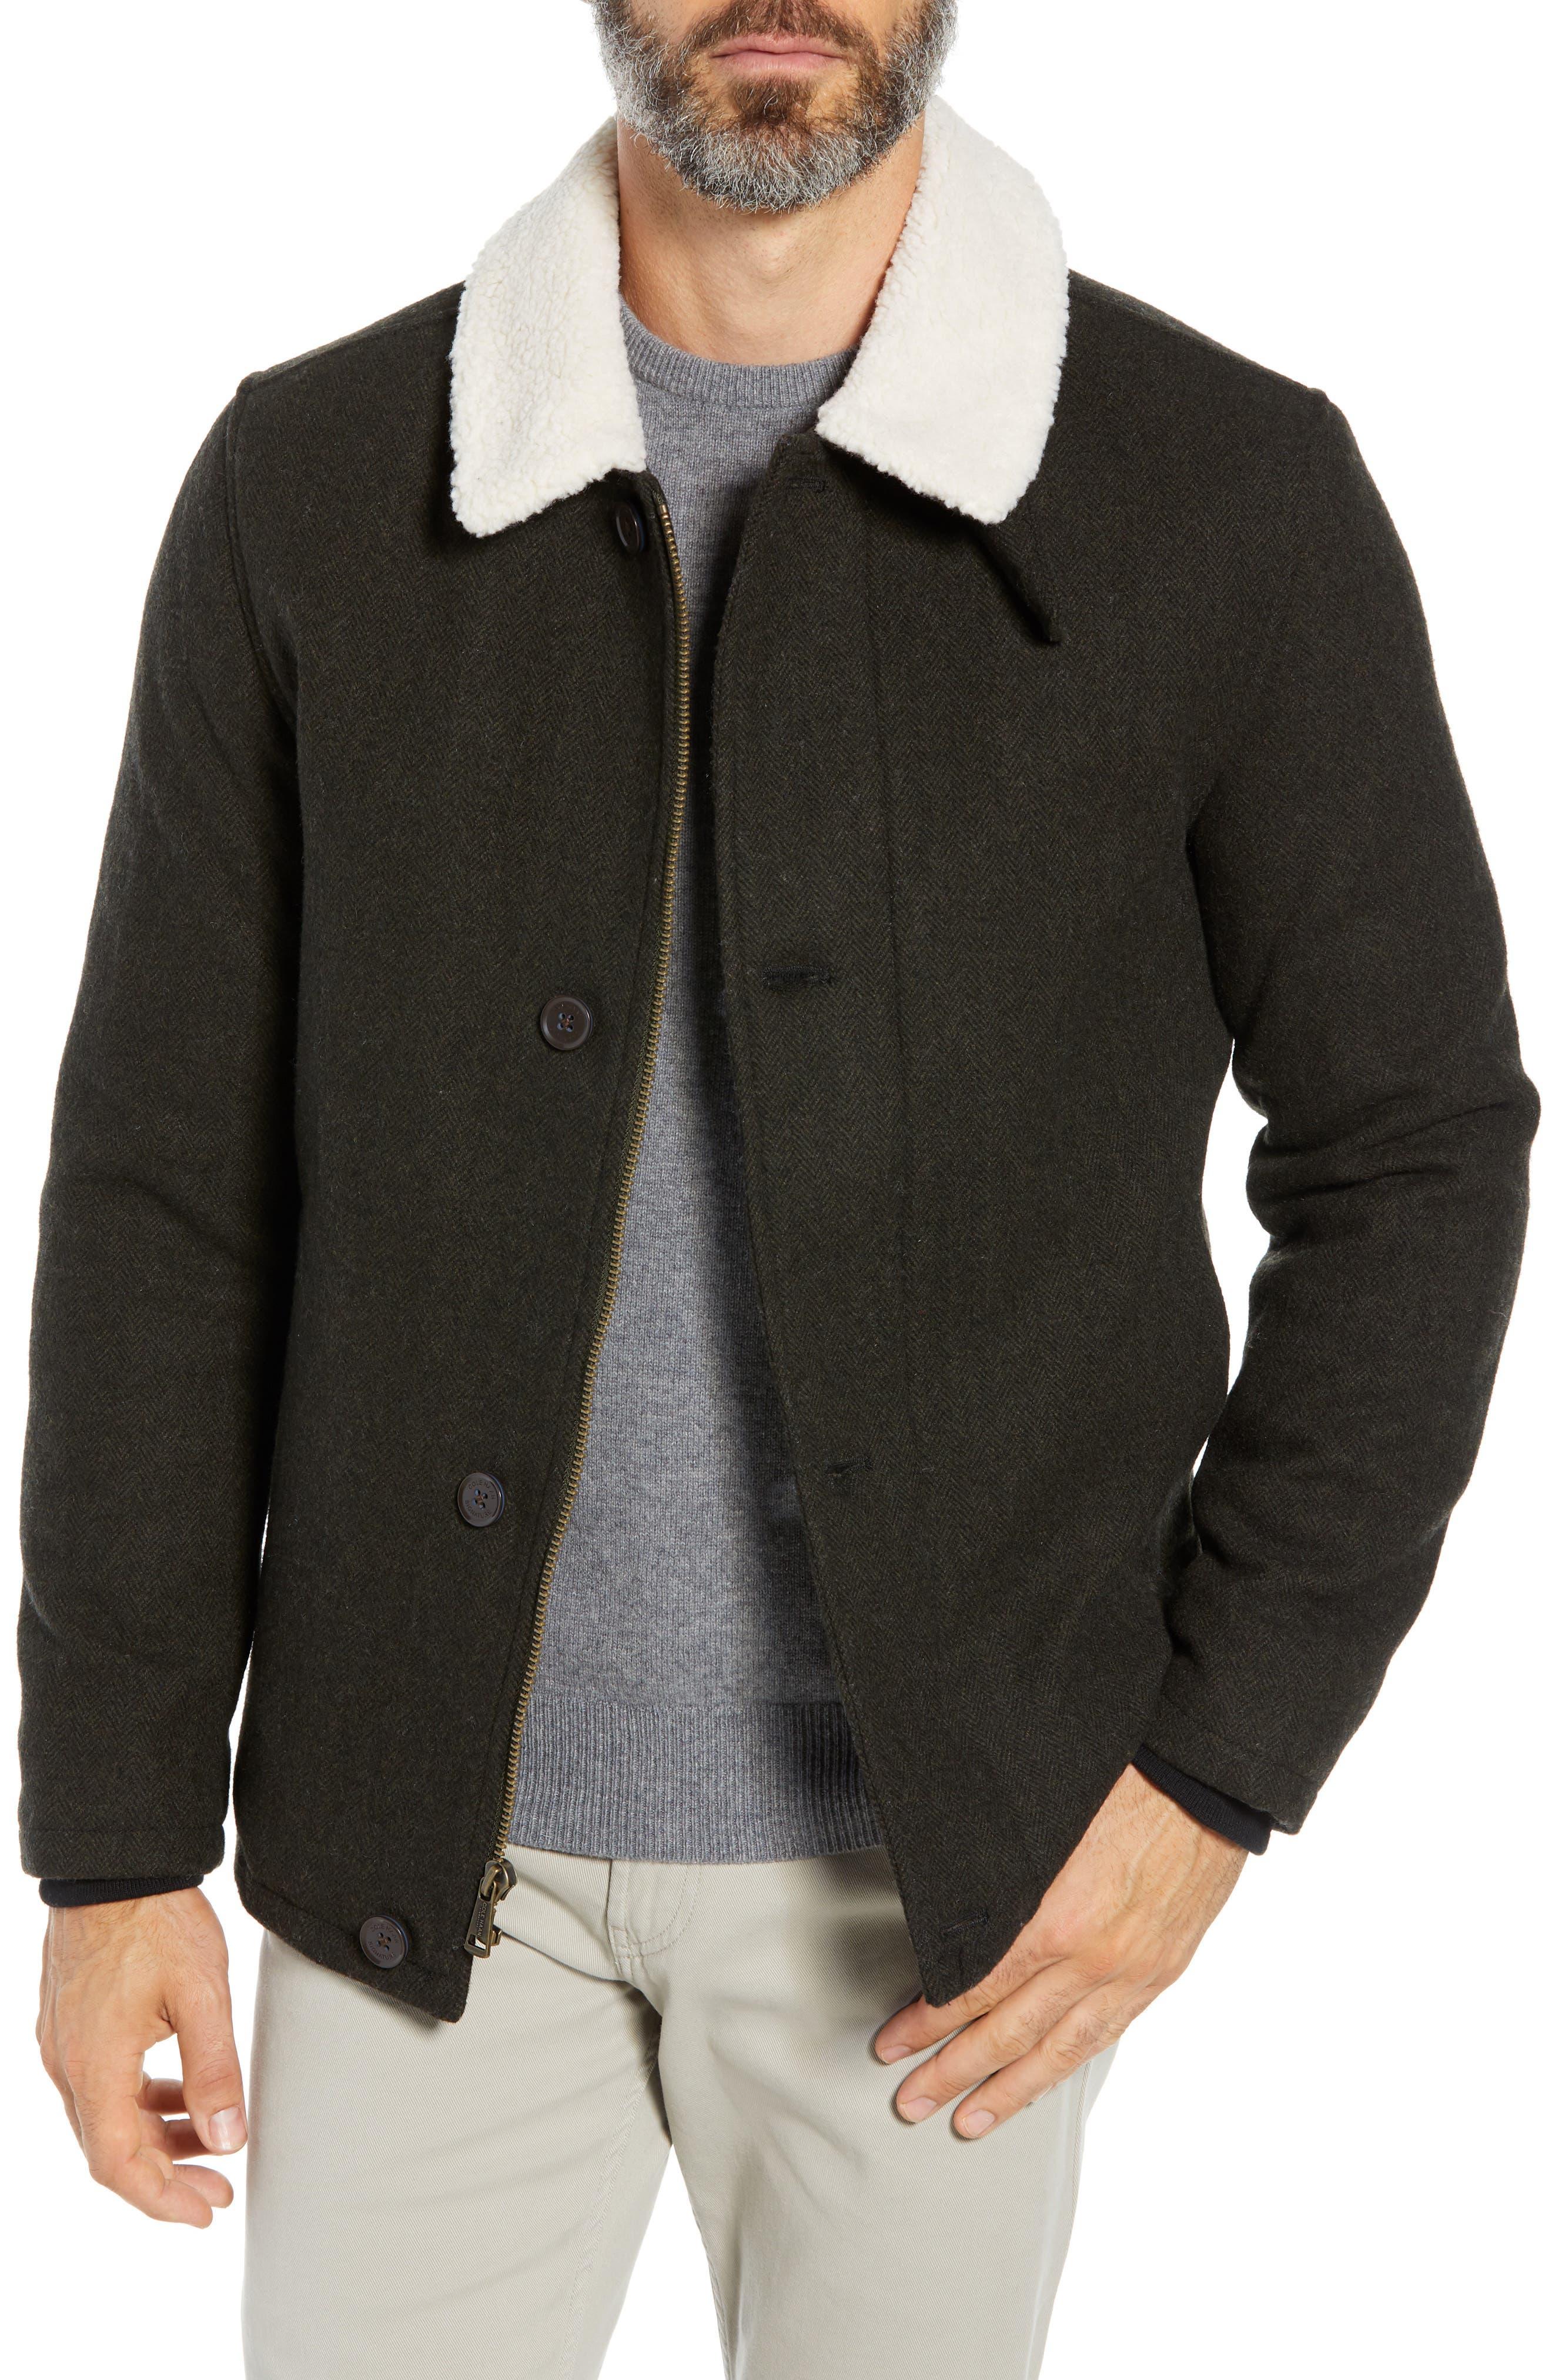 COLE HAAN SIGNATURE,                             Faux Shearling Trim Field Jacket,                             Main thumbnail 1, color,                             317